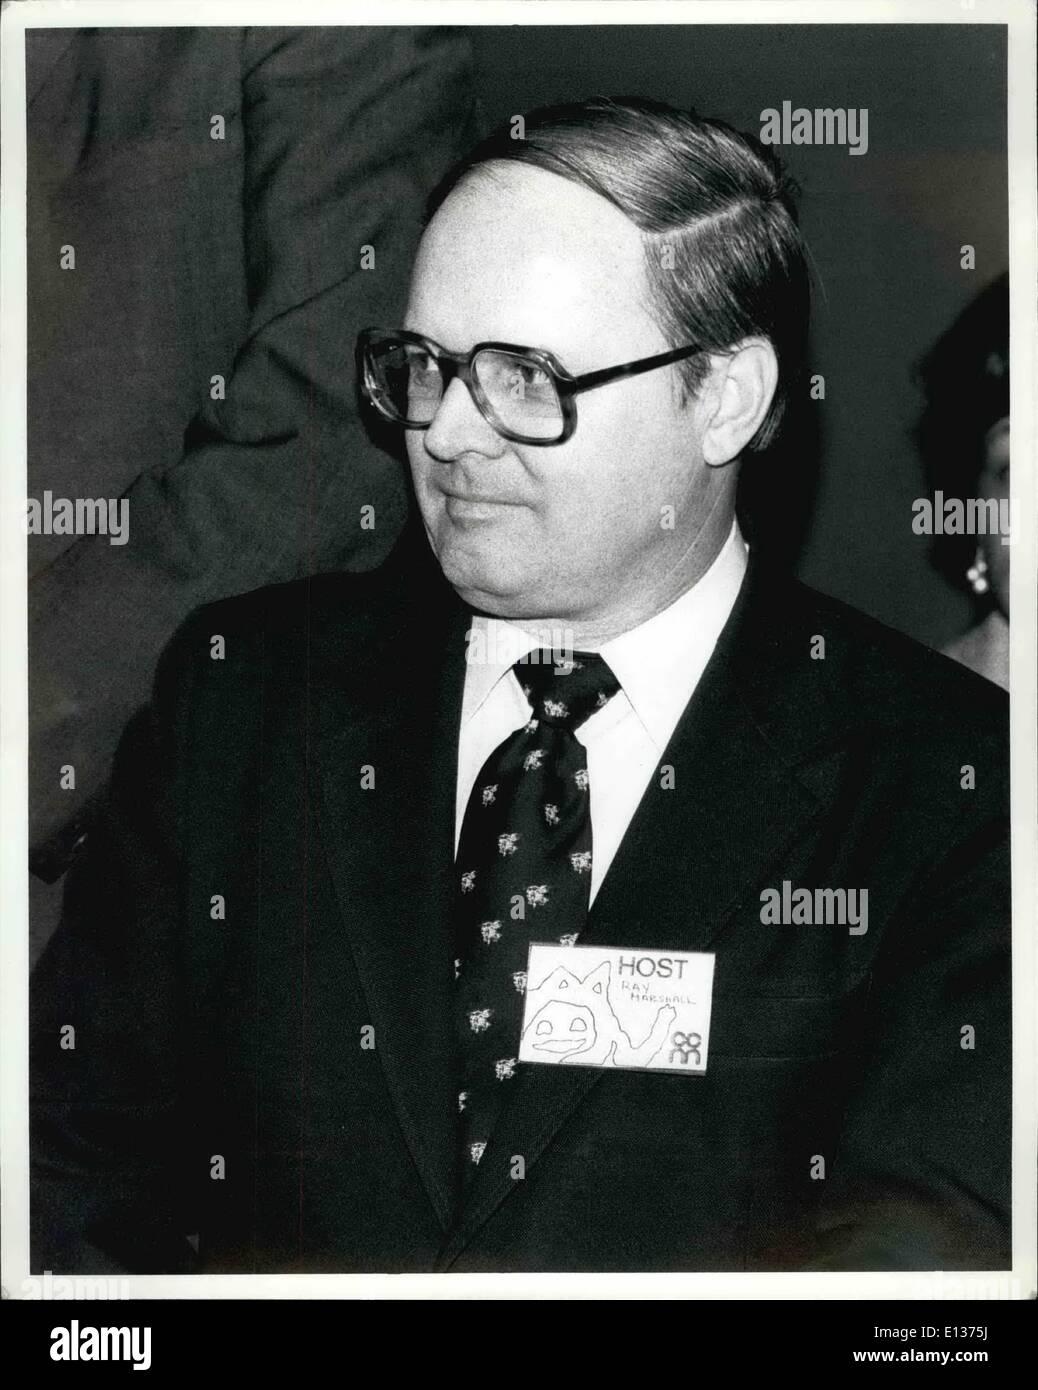 Feb. 29, 2012 - Ray Marshall - Stock Image